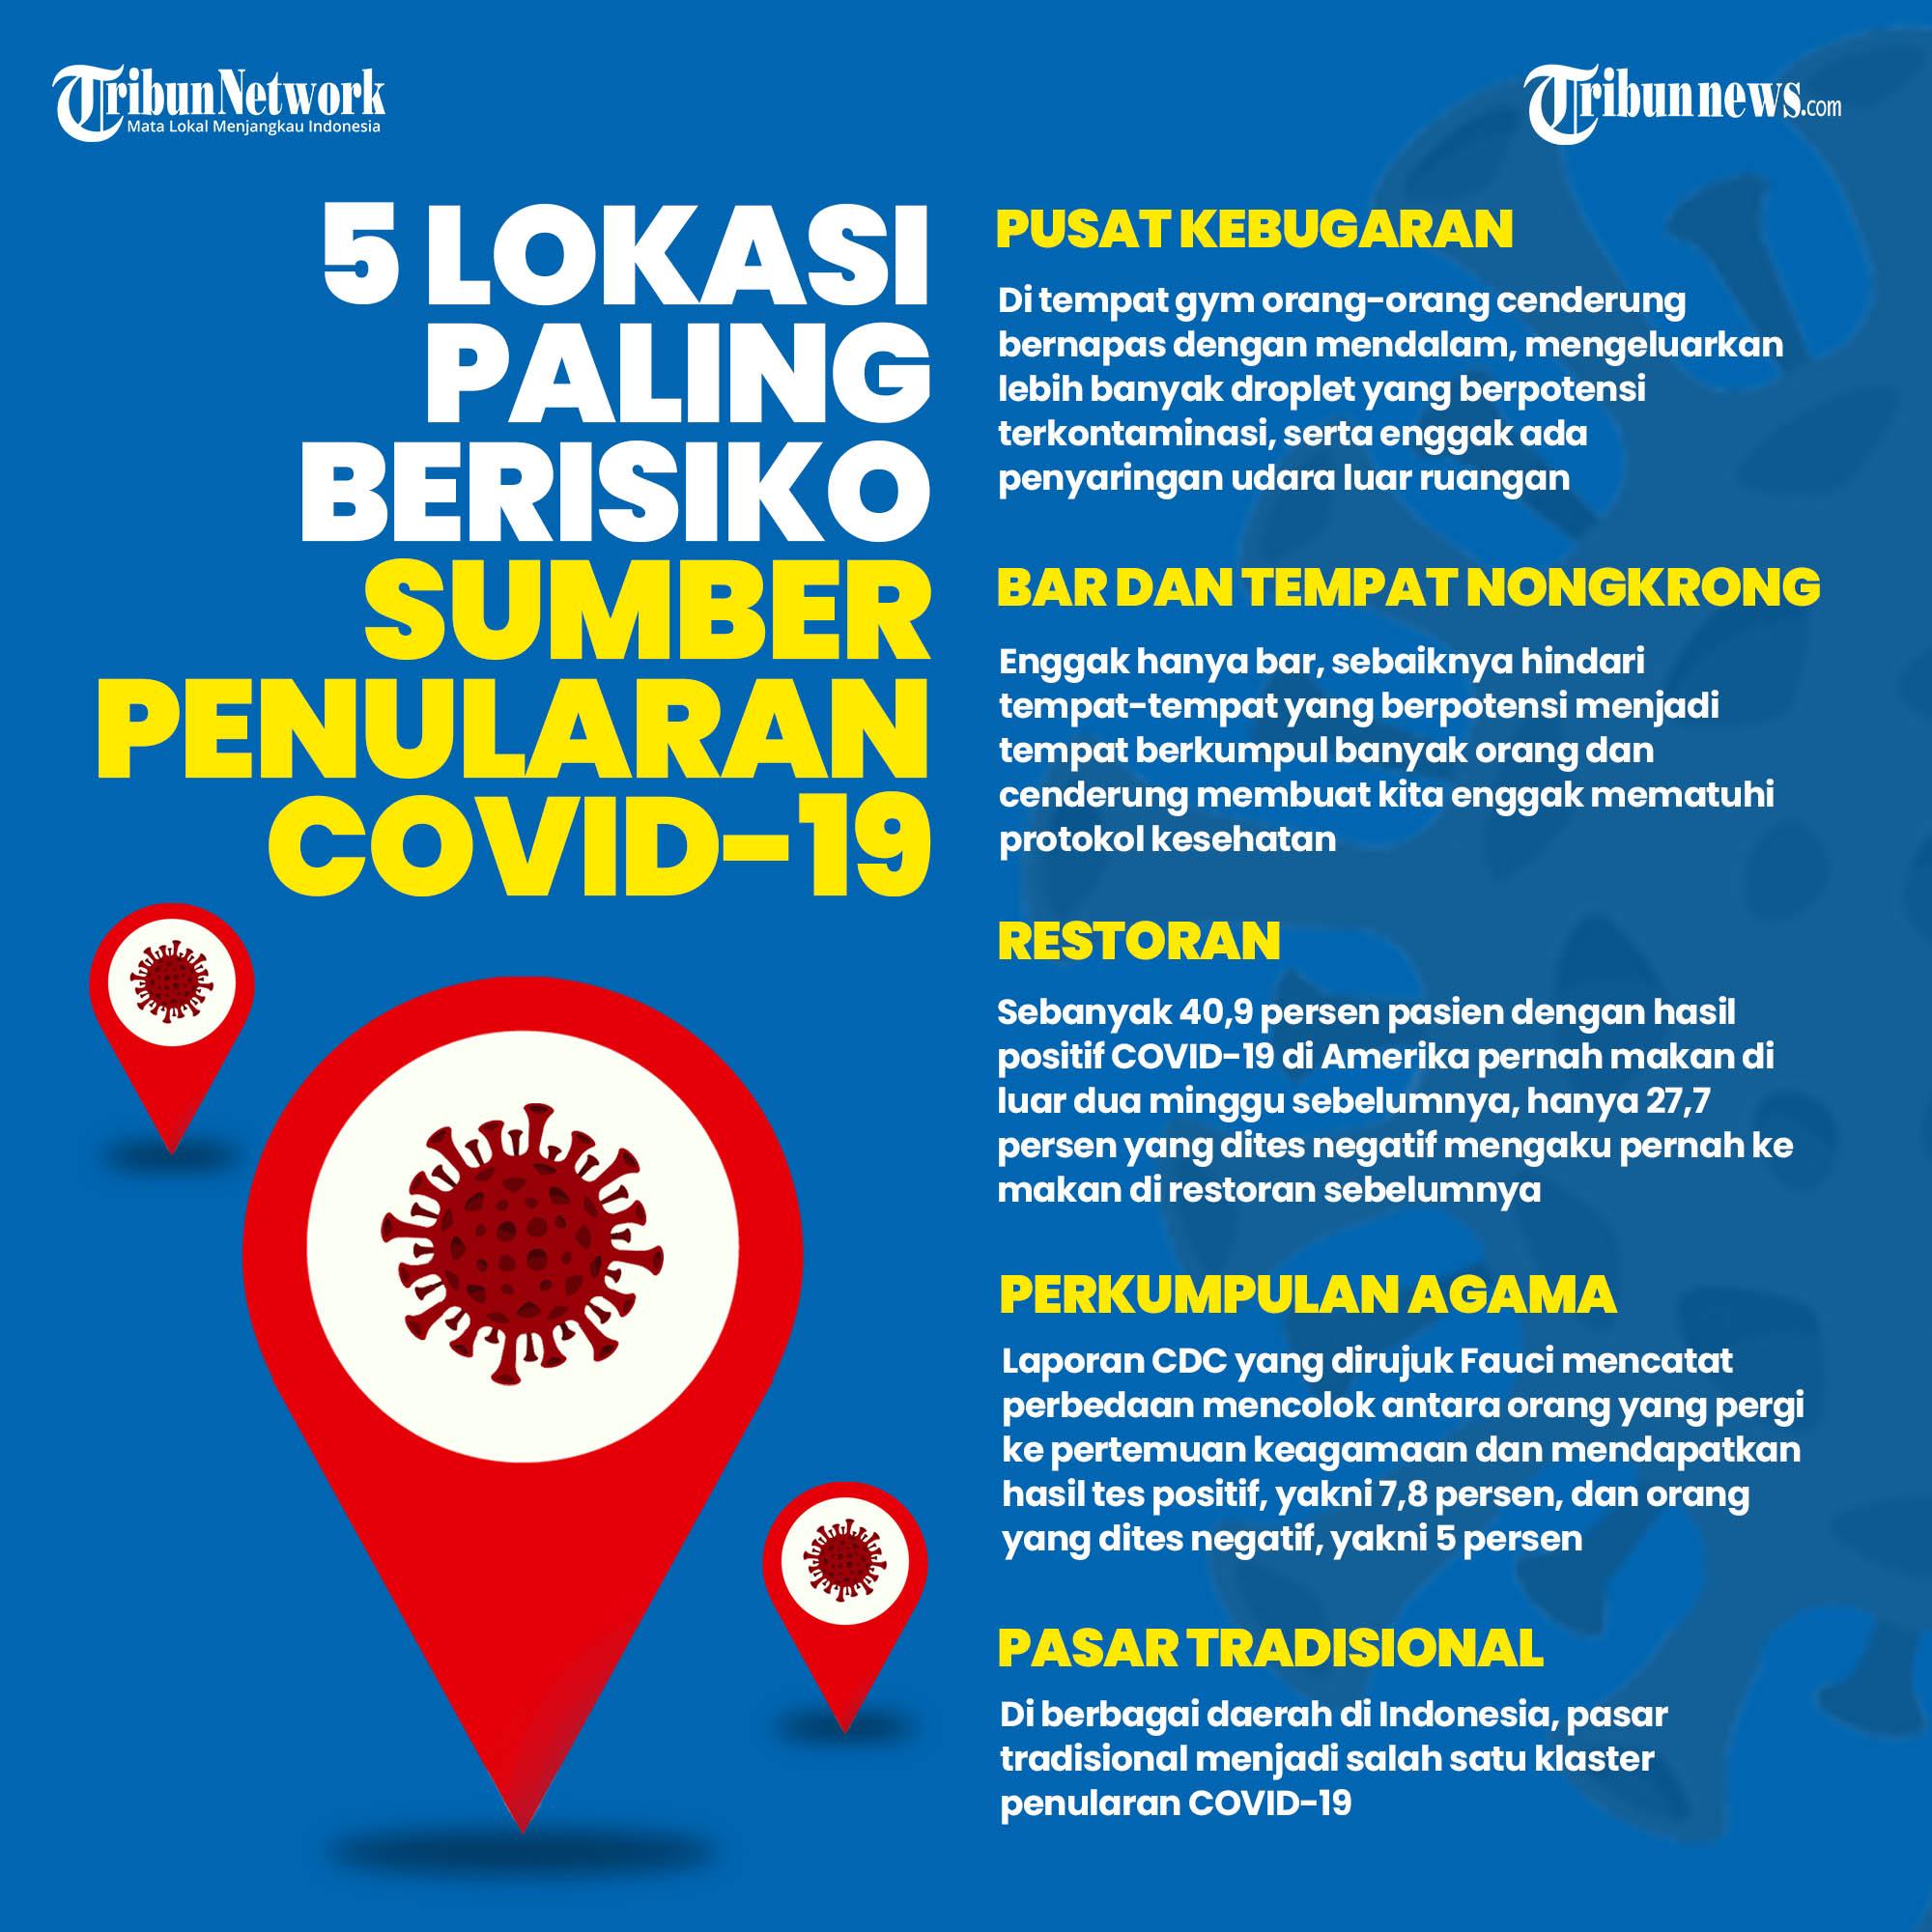 Infografis 5 Lokasi Paling Beresiko Sumber Penularan Covid-19. TRIBUNNEWS/Ridho Hendrikos